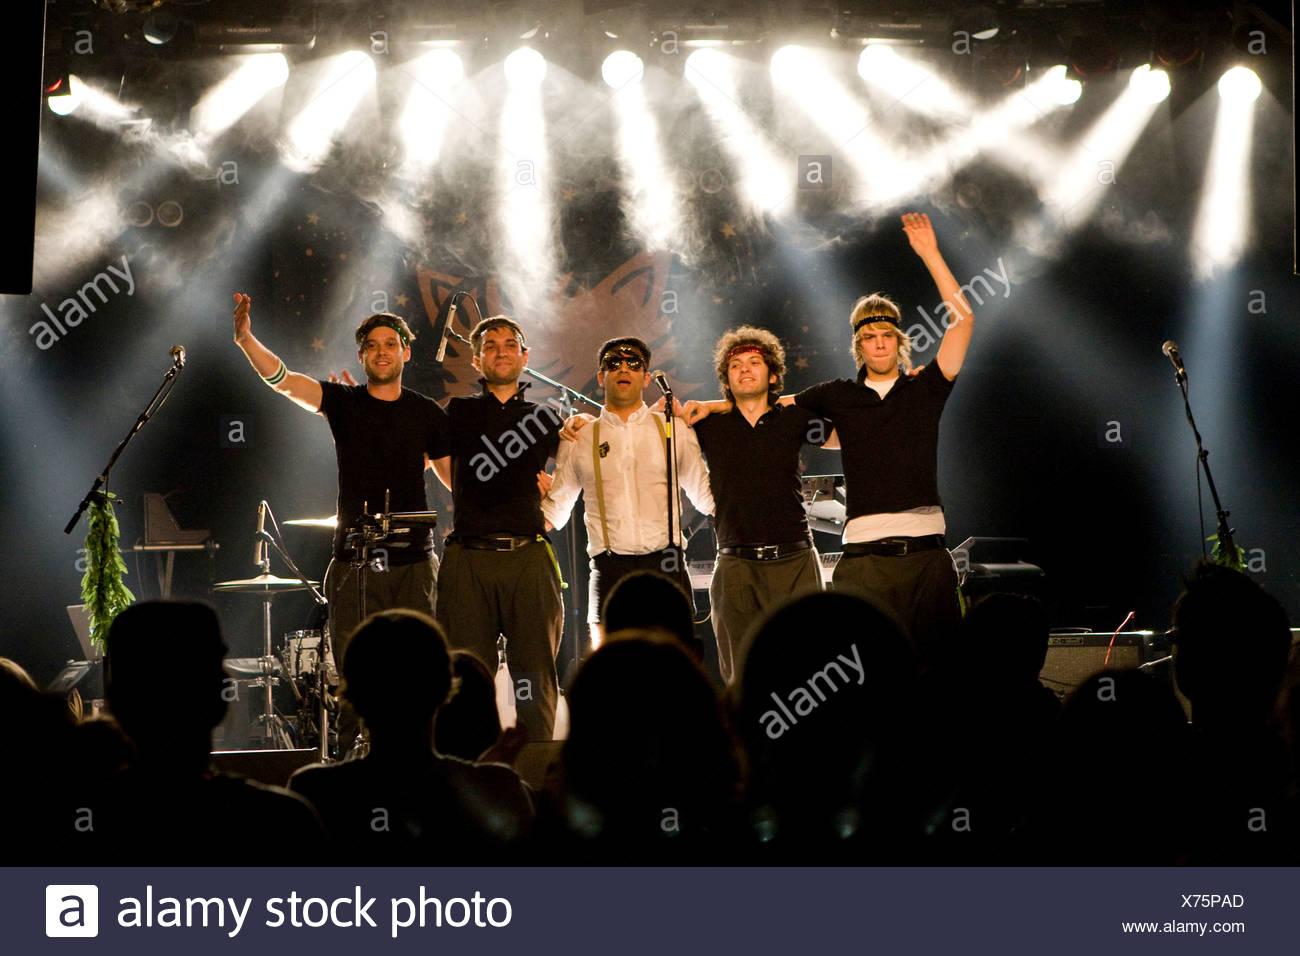 La banda alemana viven en el Tigre tímido Schueuer Concert Hall, Lucerna, Suiza Imagen De Stock